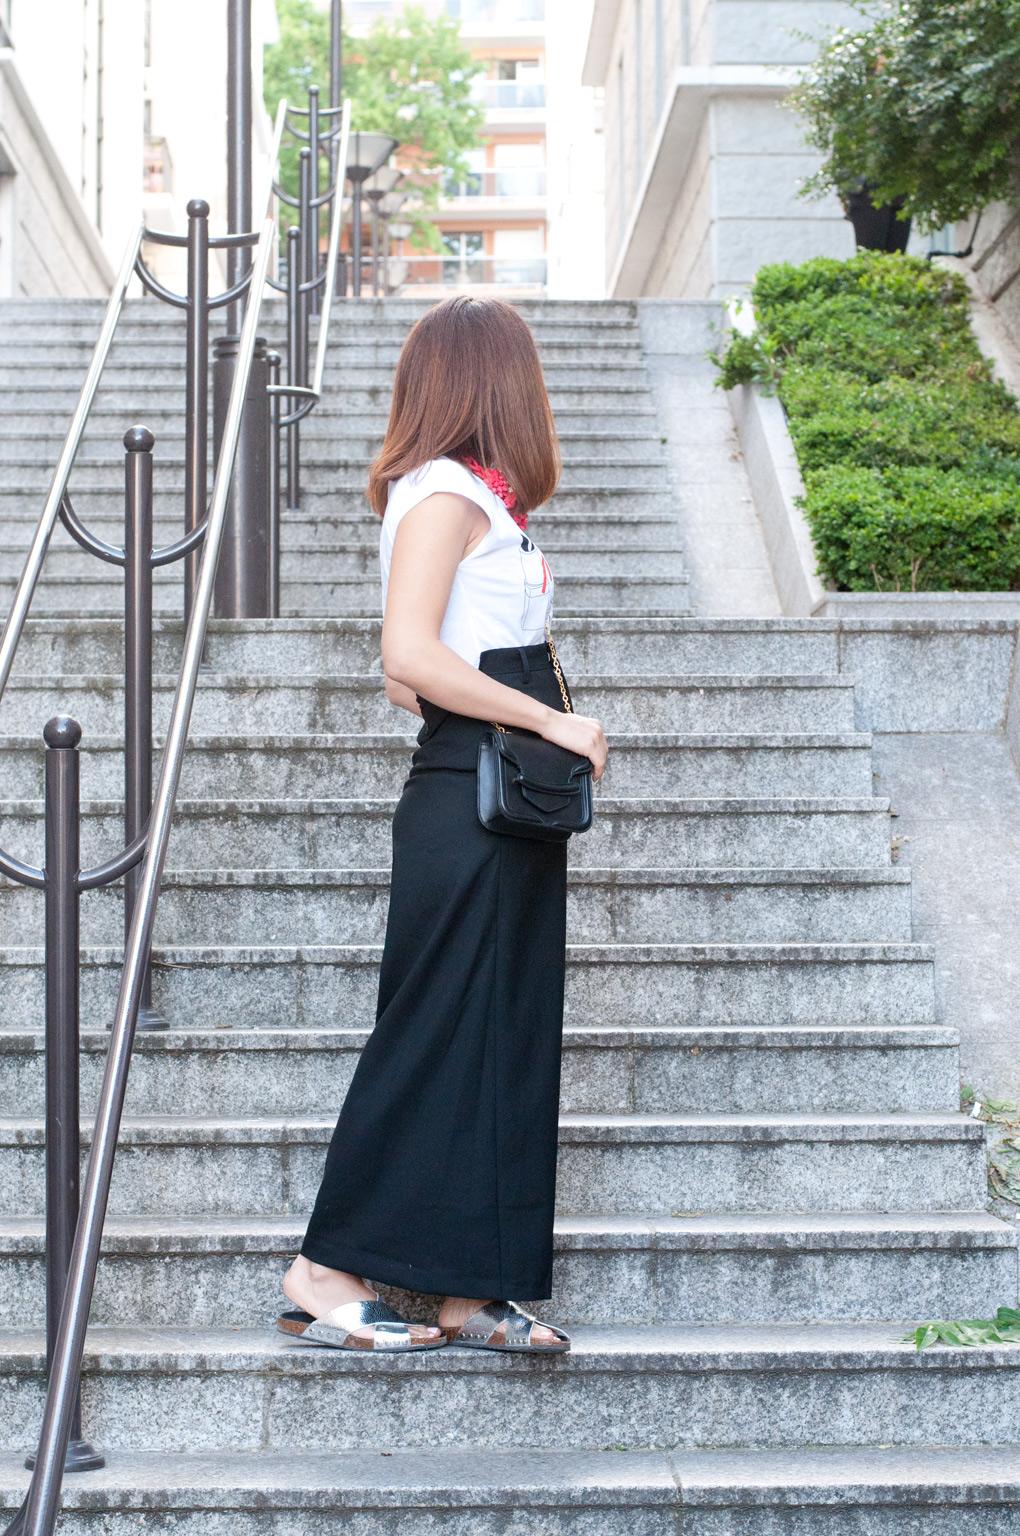 Lyla_Loves_Fashion_Junya_Watanabe_Trousers_Stella_McCartney_Tshirt_5917